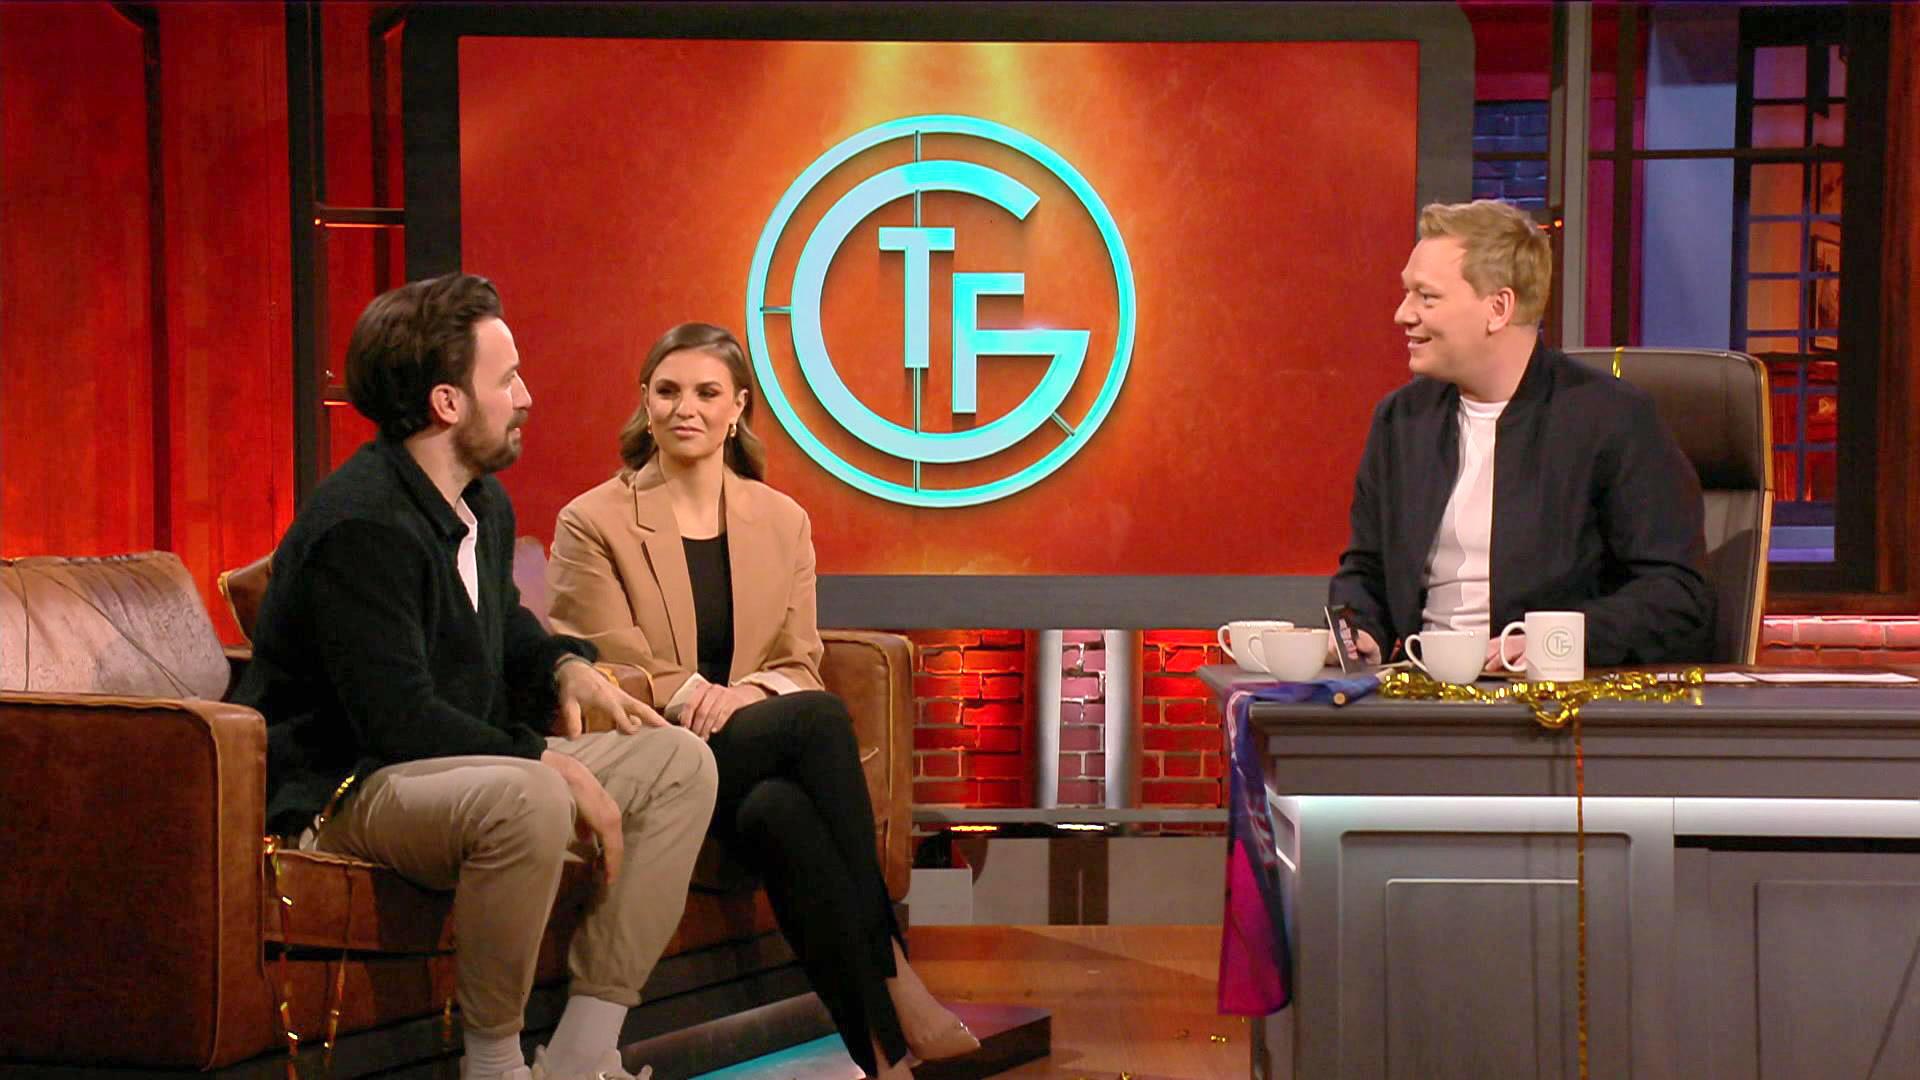 Folge 32 mit Jan Köppen und Laura Wontorra   Folge 32